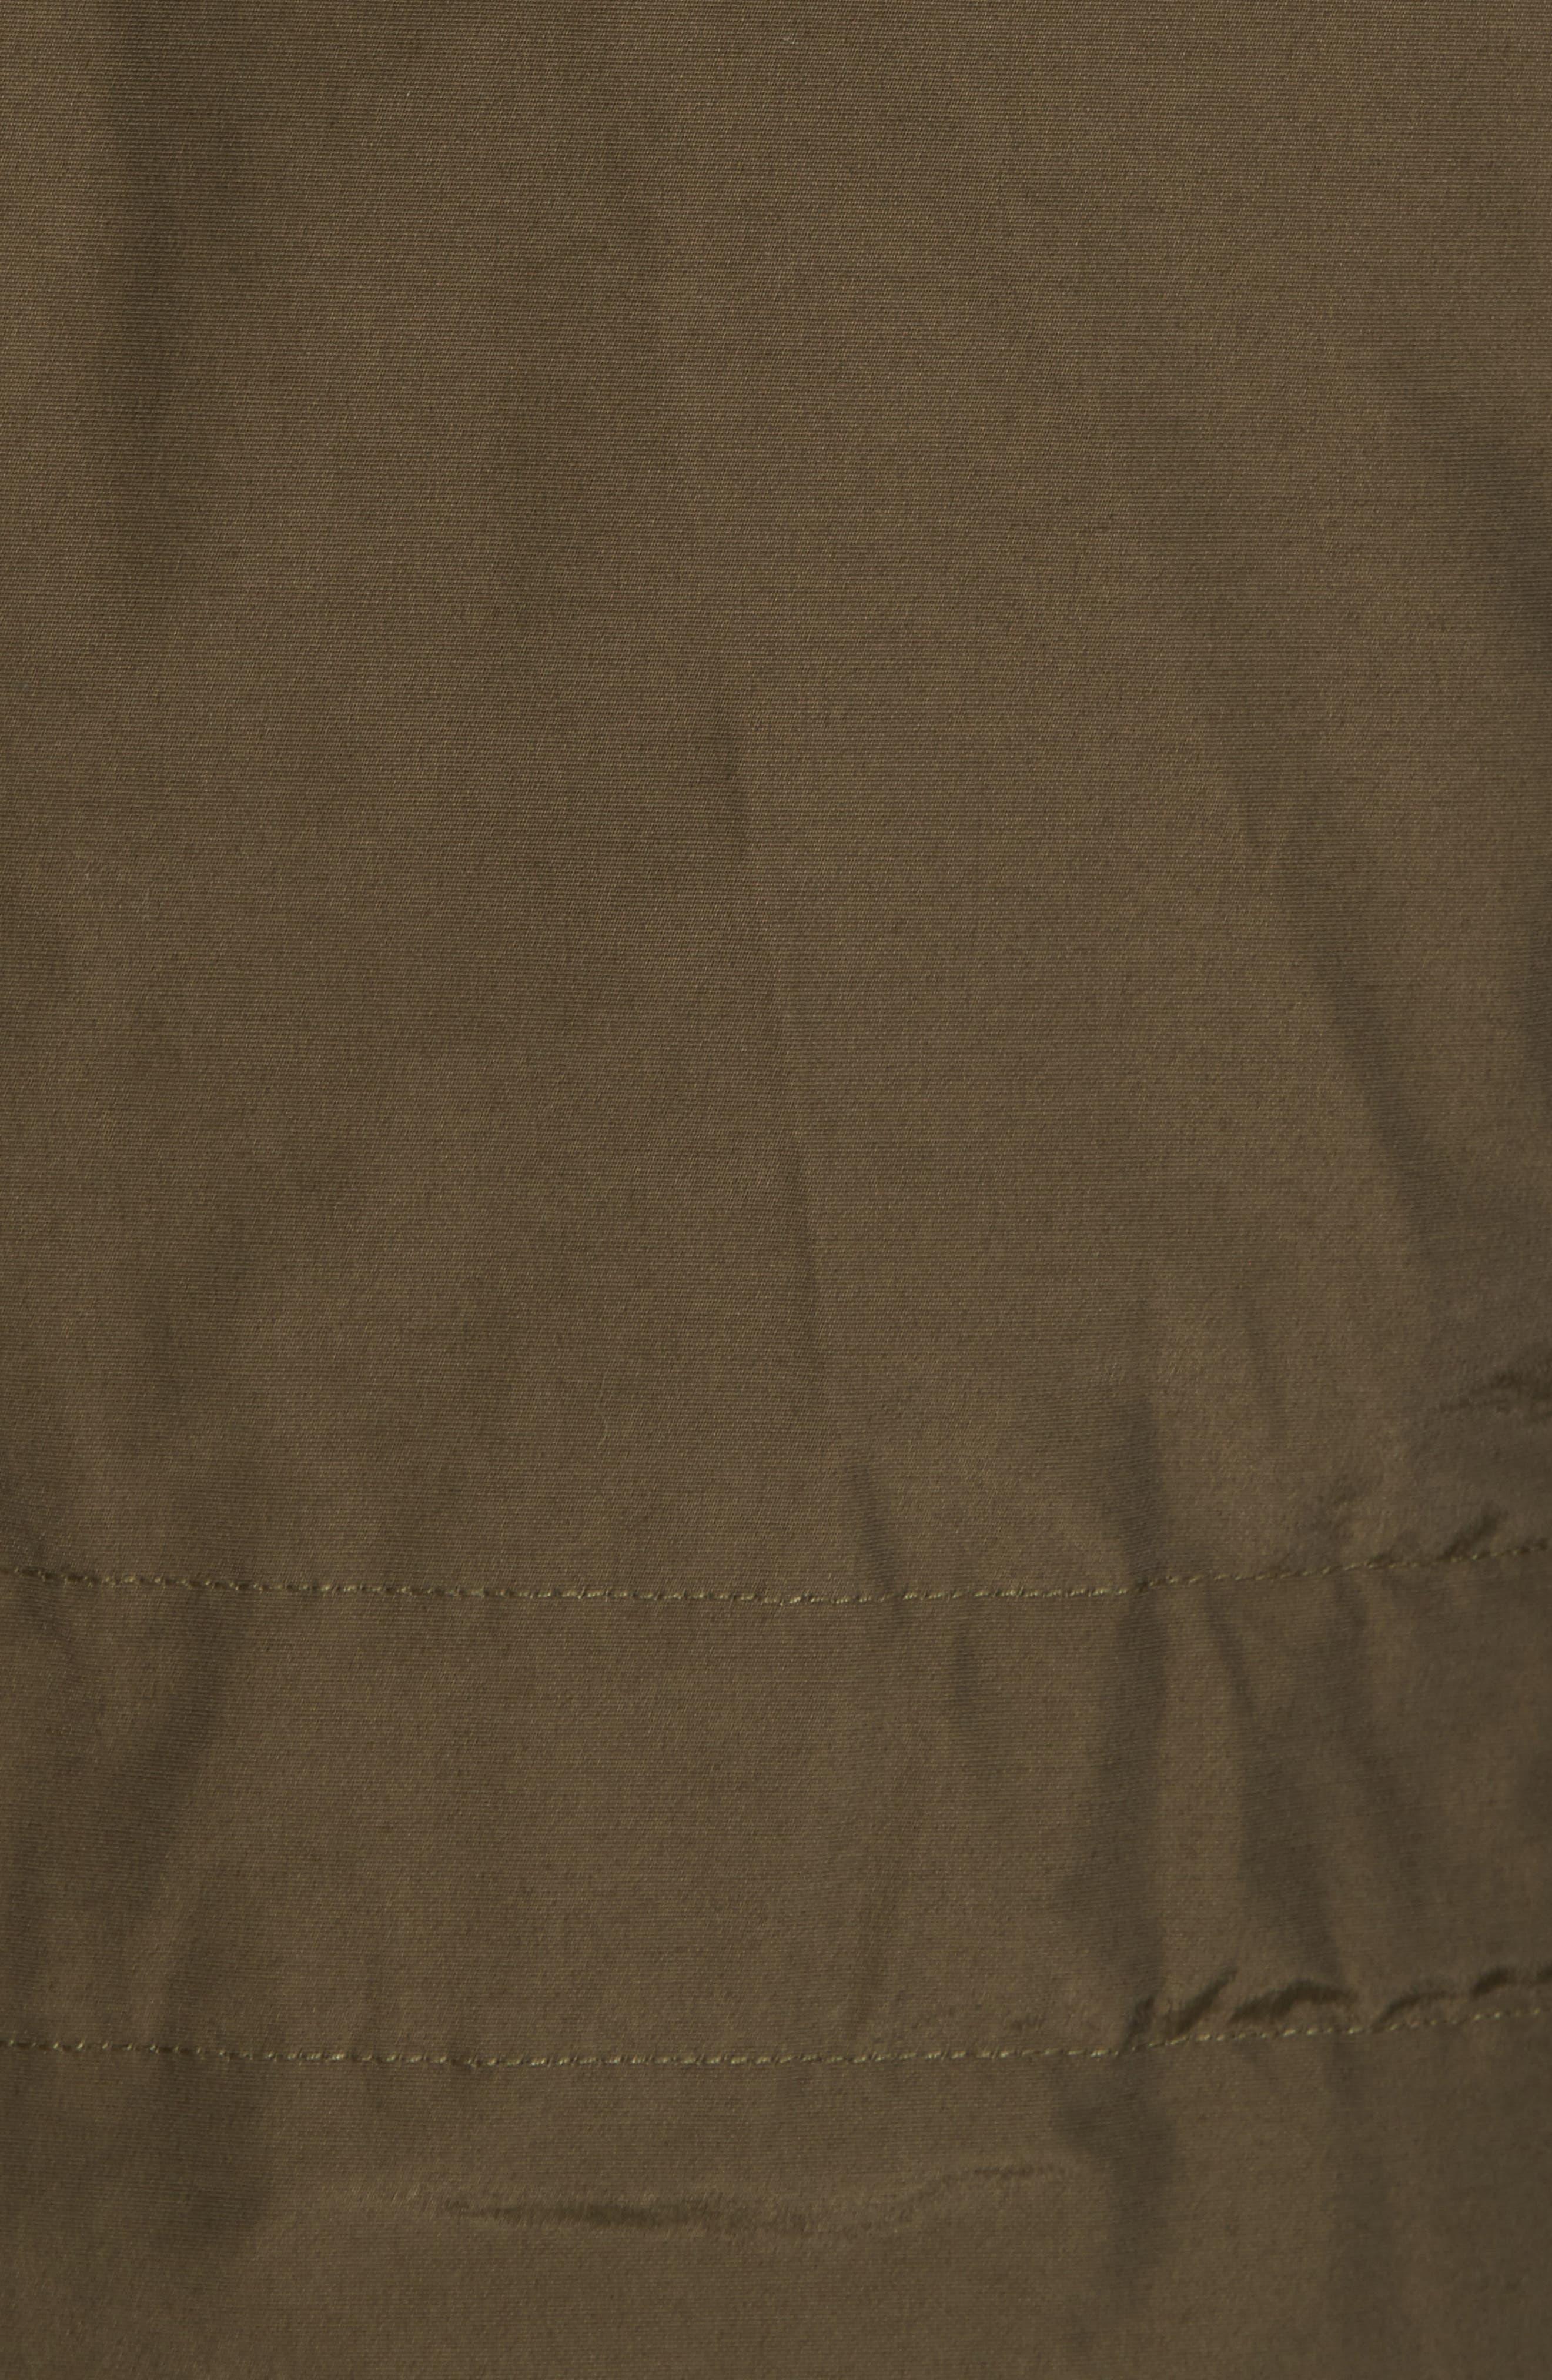 John Rich & Bros. Polar Down Parka with Genuine Coyote Fur Trim,                             Alternate thumbnail 6, color,                             Dark Green